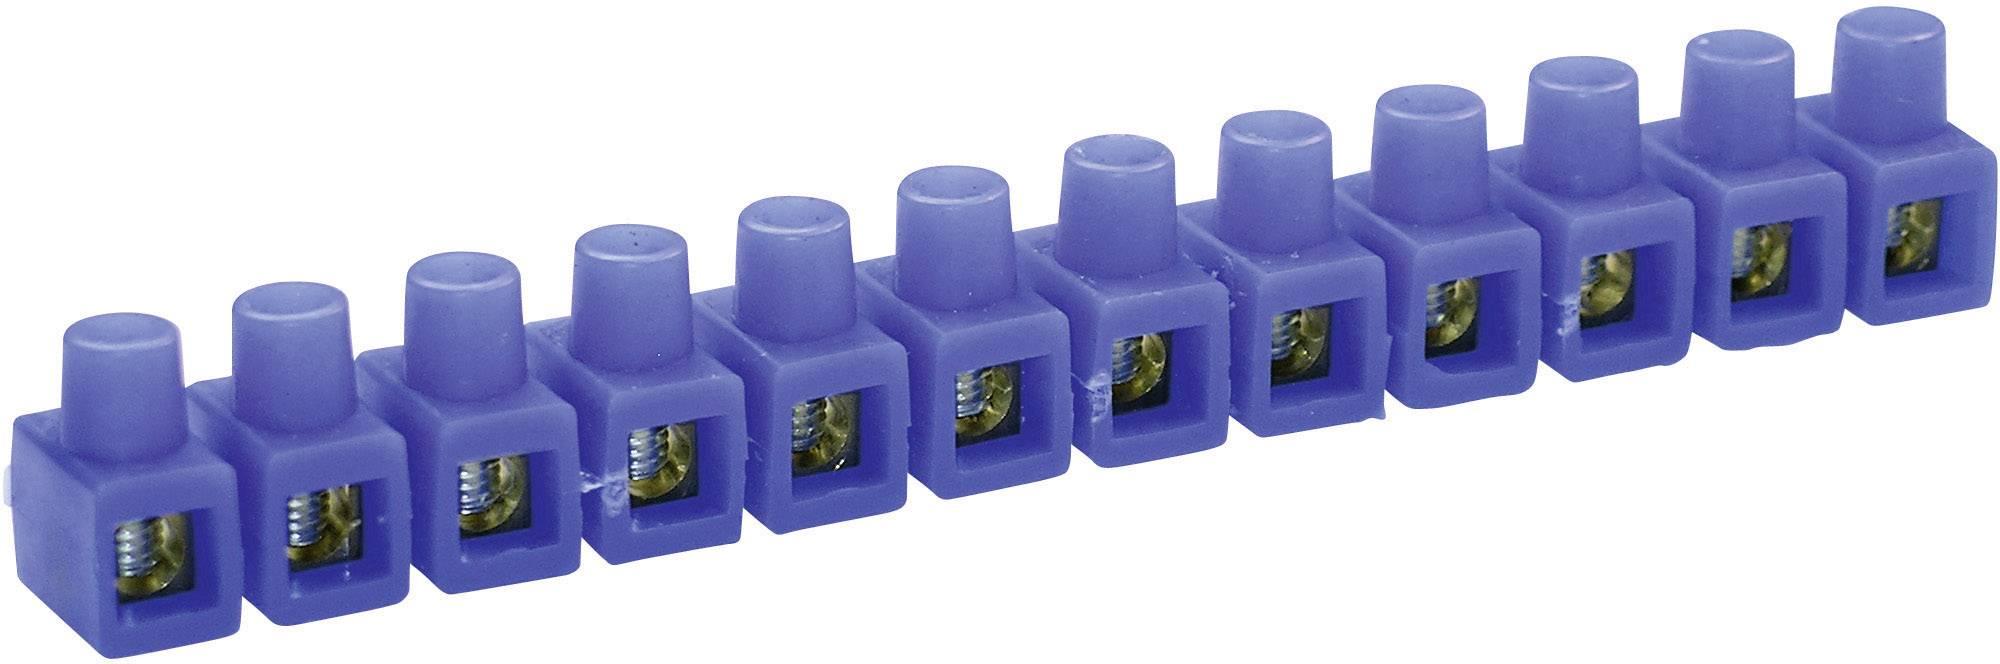 Svorka Kaiser, 663/bl, 2,5 - 6 mm², 12pólová, modrá